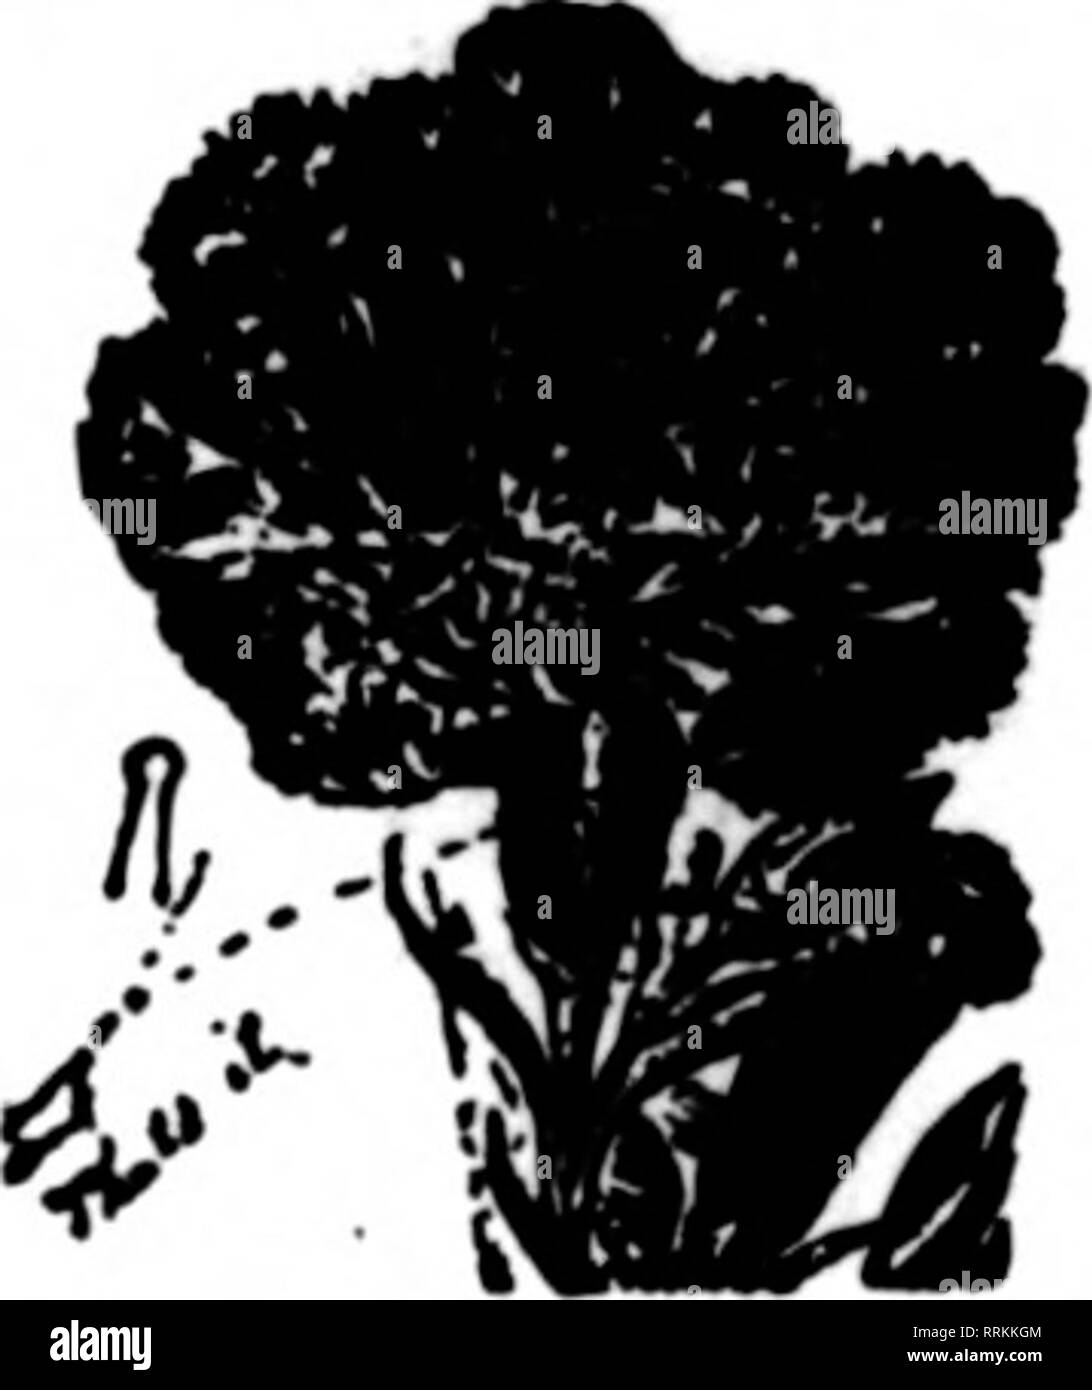 Florists' review [microform]  Floriculture  Mi'ntlon Thi